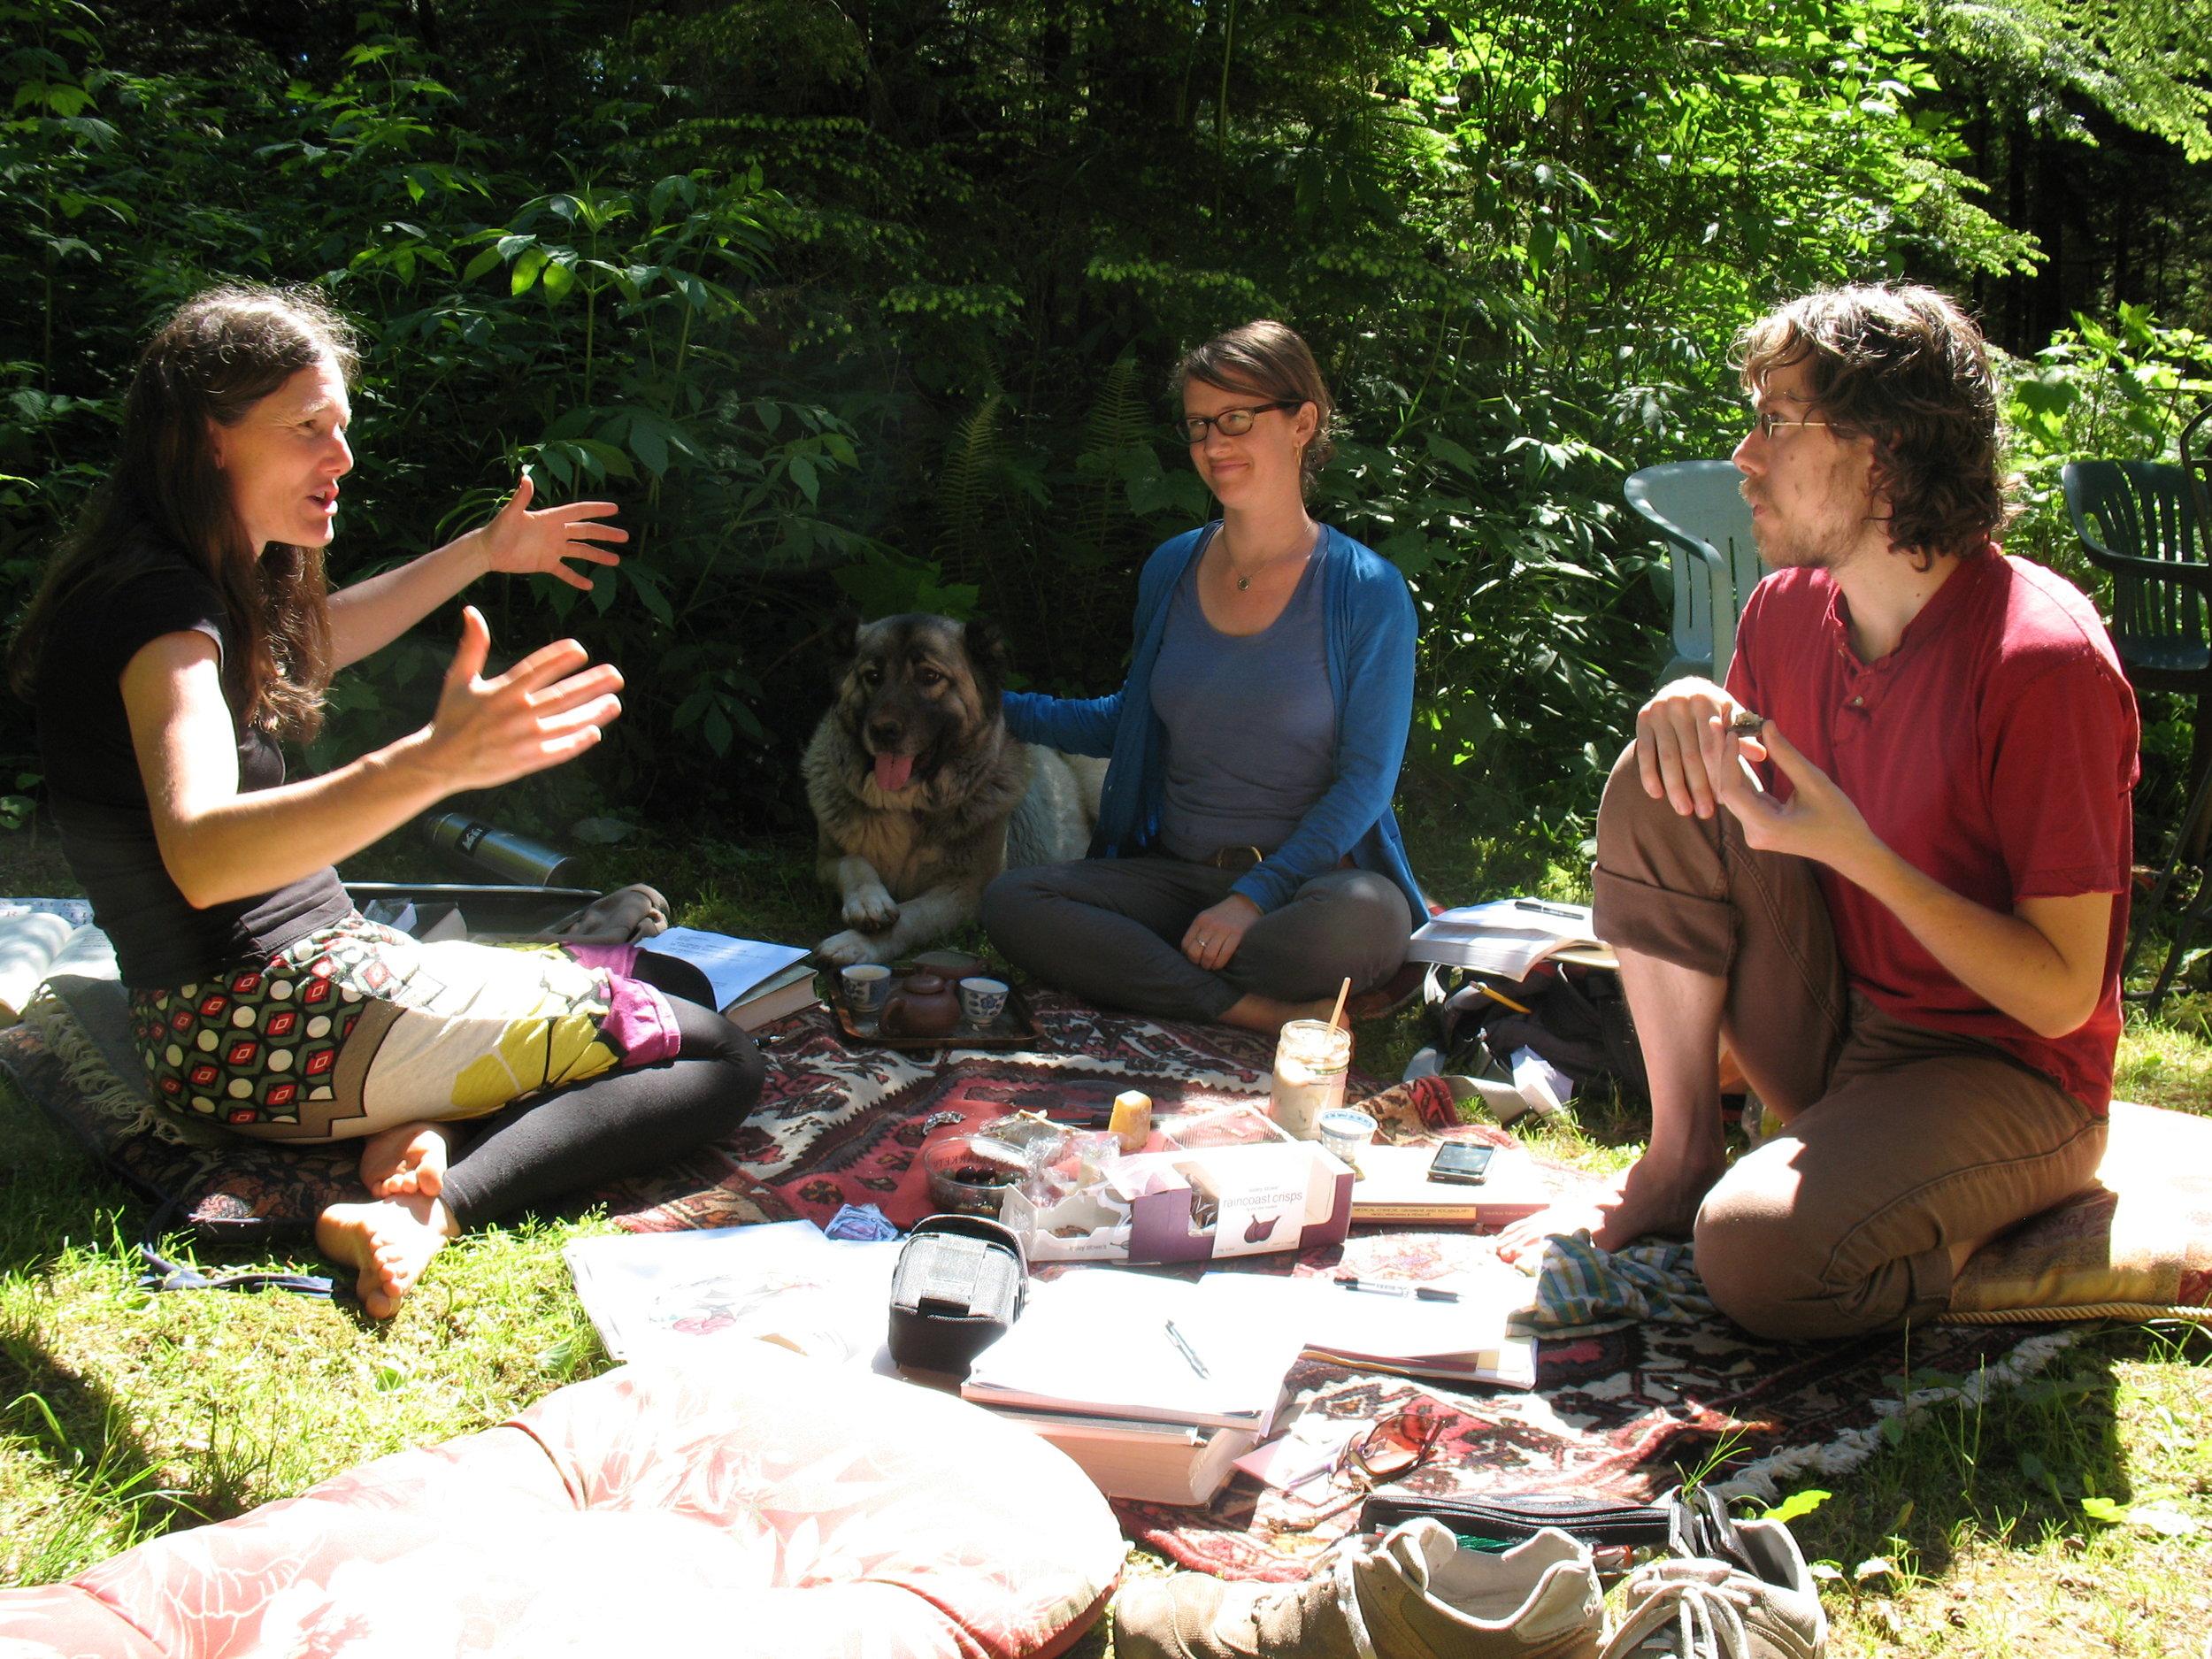 Image of Sabine Wilms teaching outdoors.